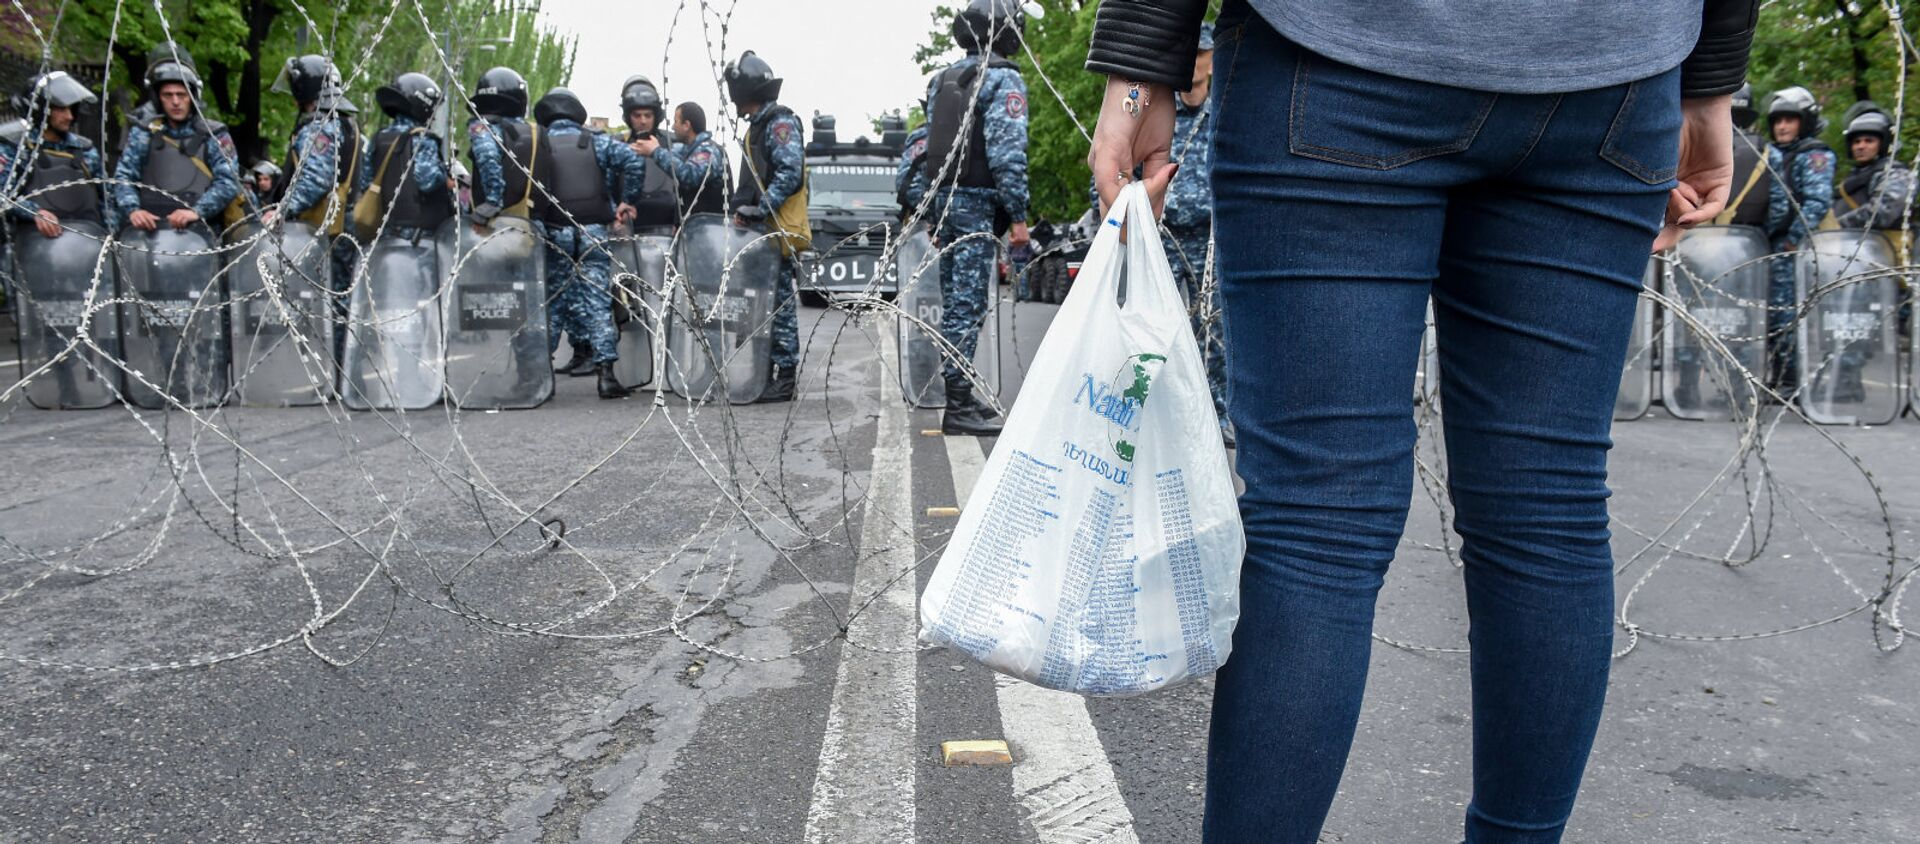 Полицейская баррикада на проспекте Баграмяна (21 апреля 2018). Ереван - Sputnik Արմենիա, 1920, 27.04.2021